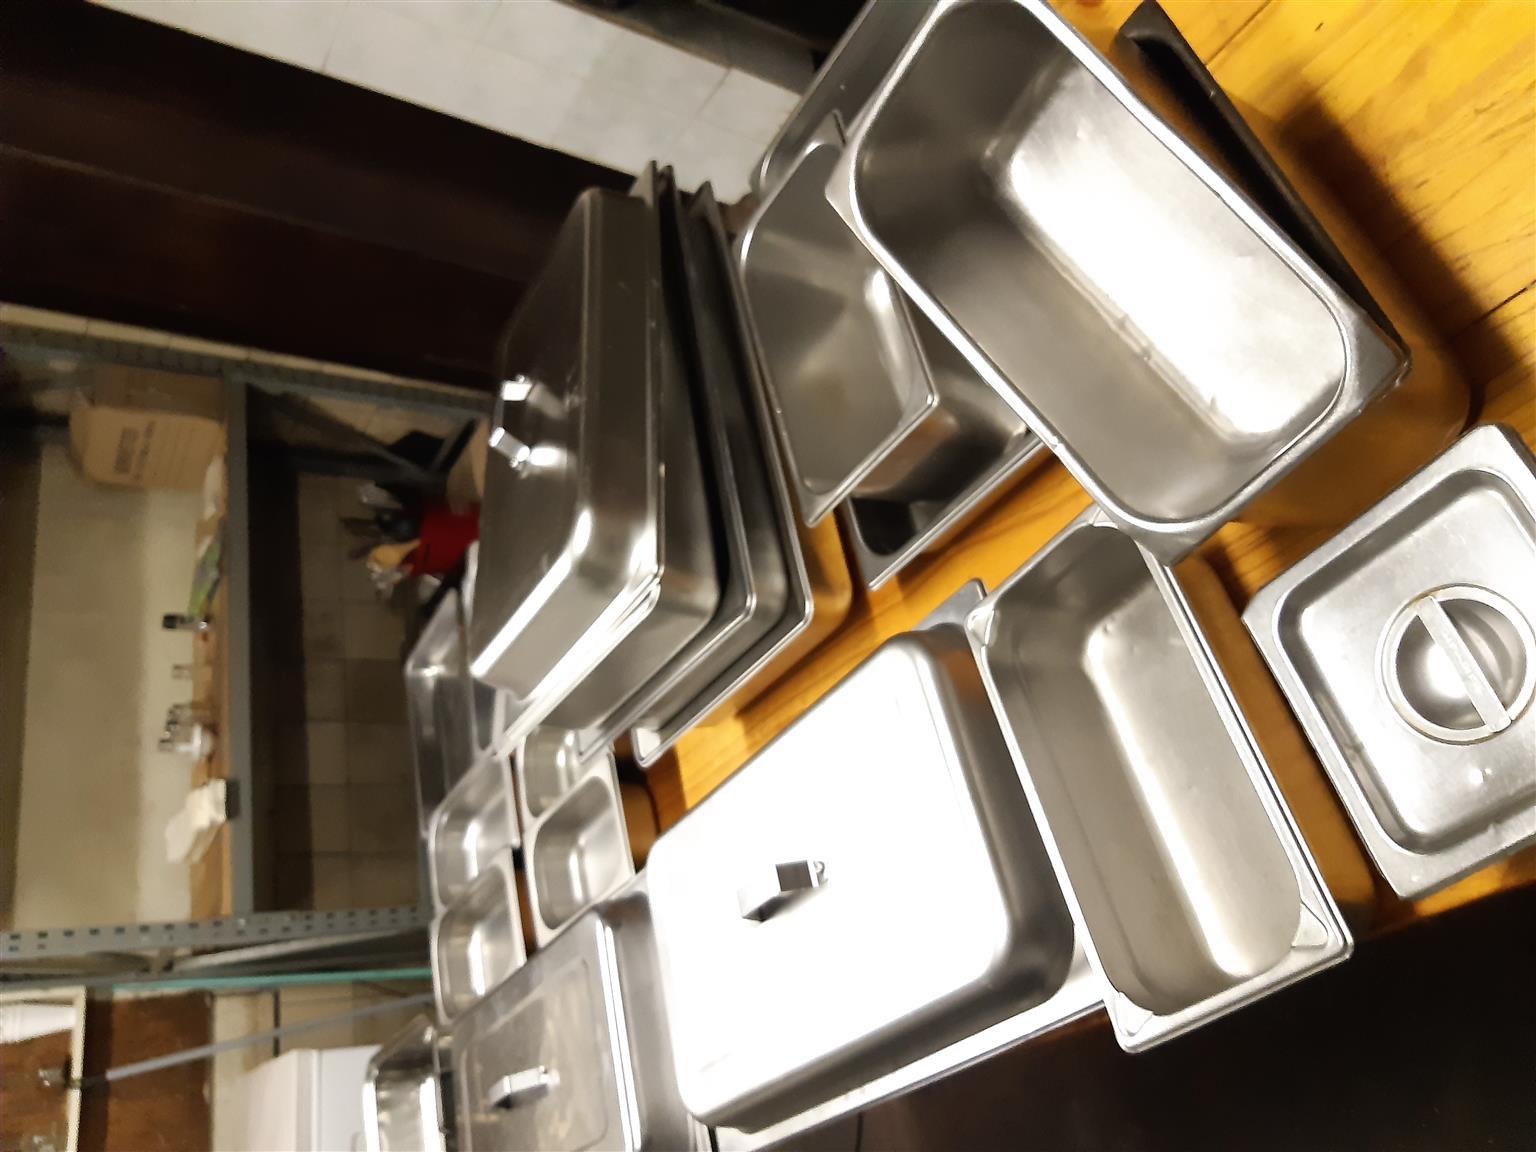 Glasware, cutlery, bay marines etc as a LOT